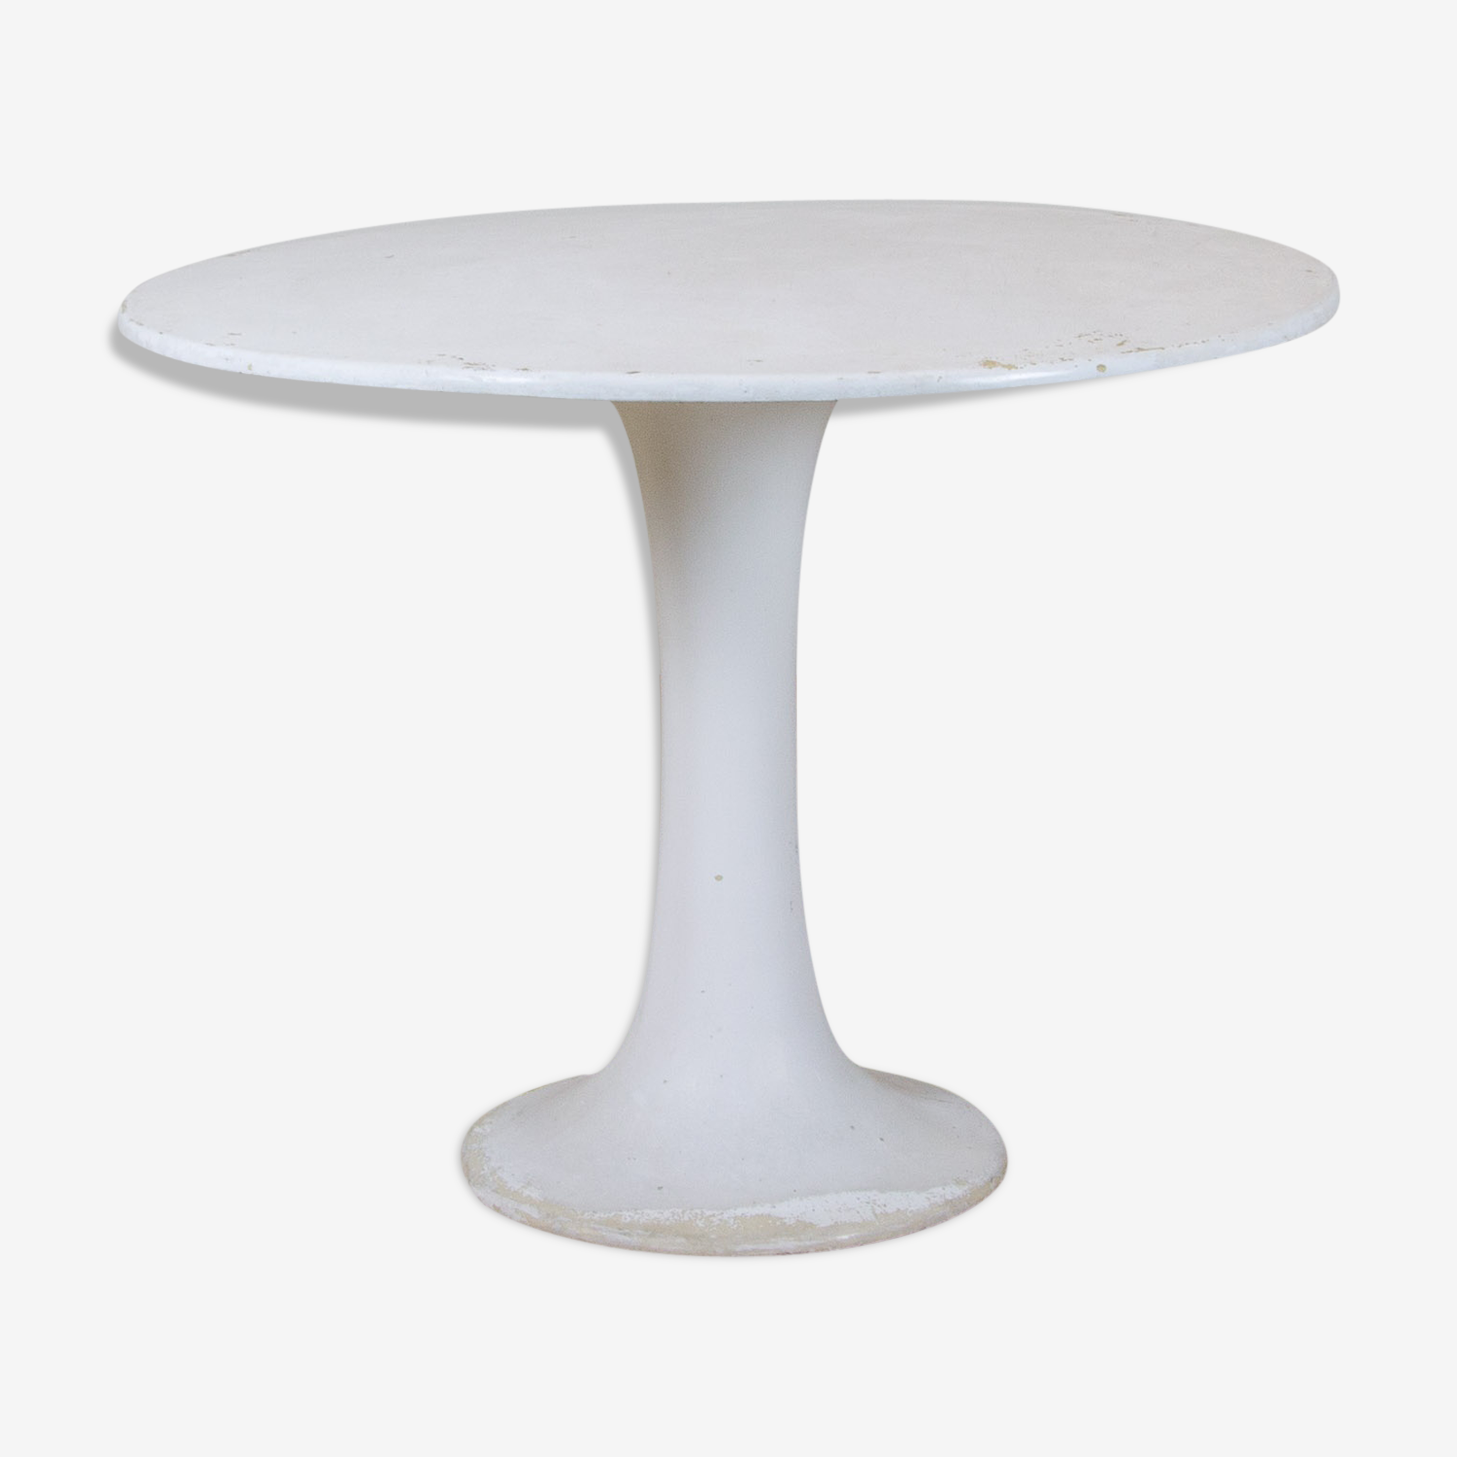 White diabolo table